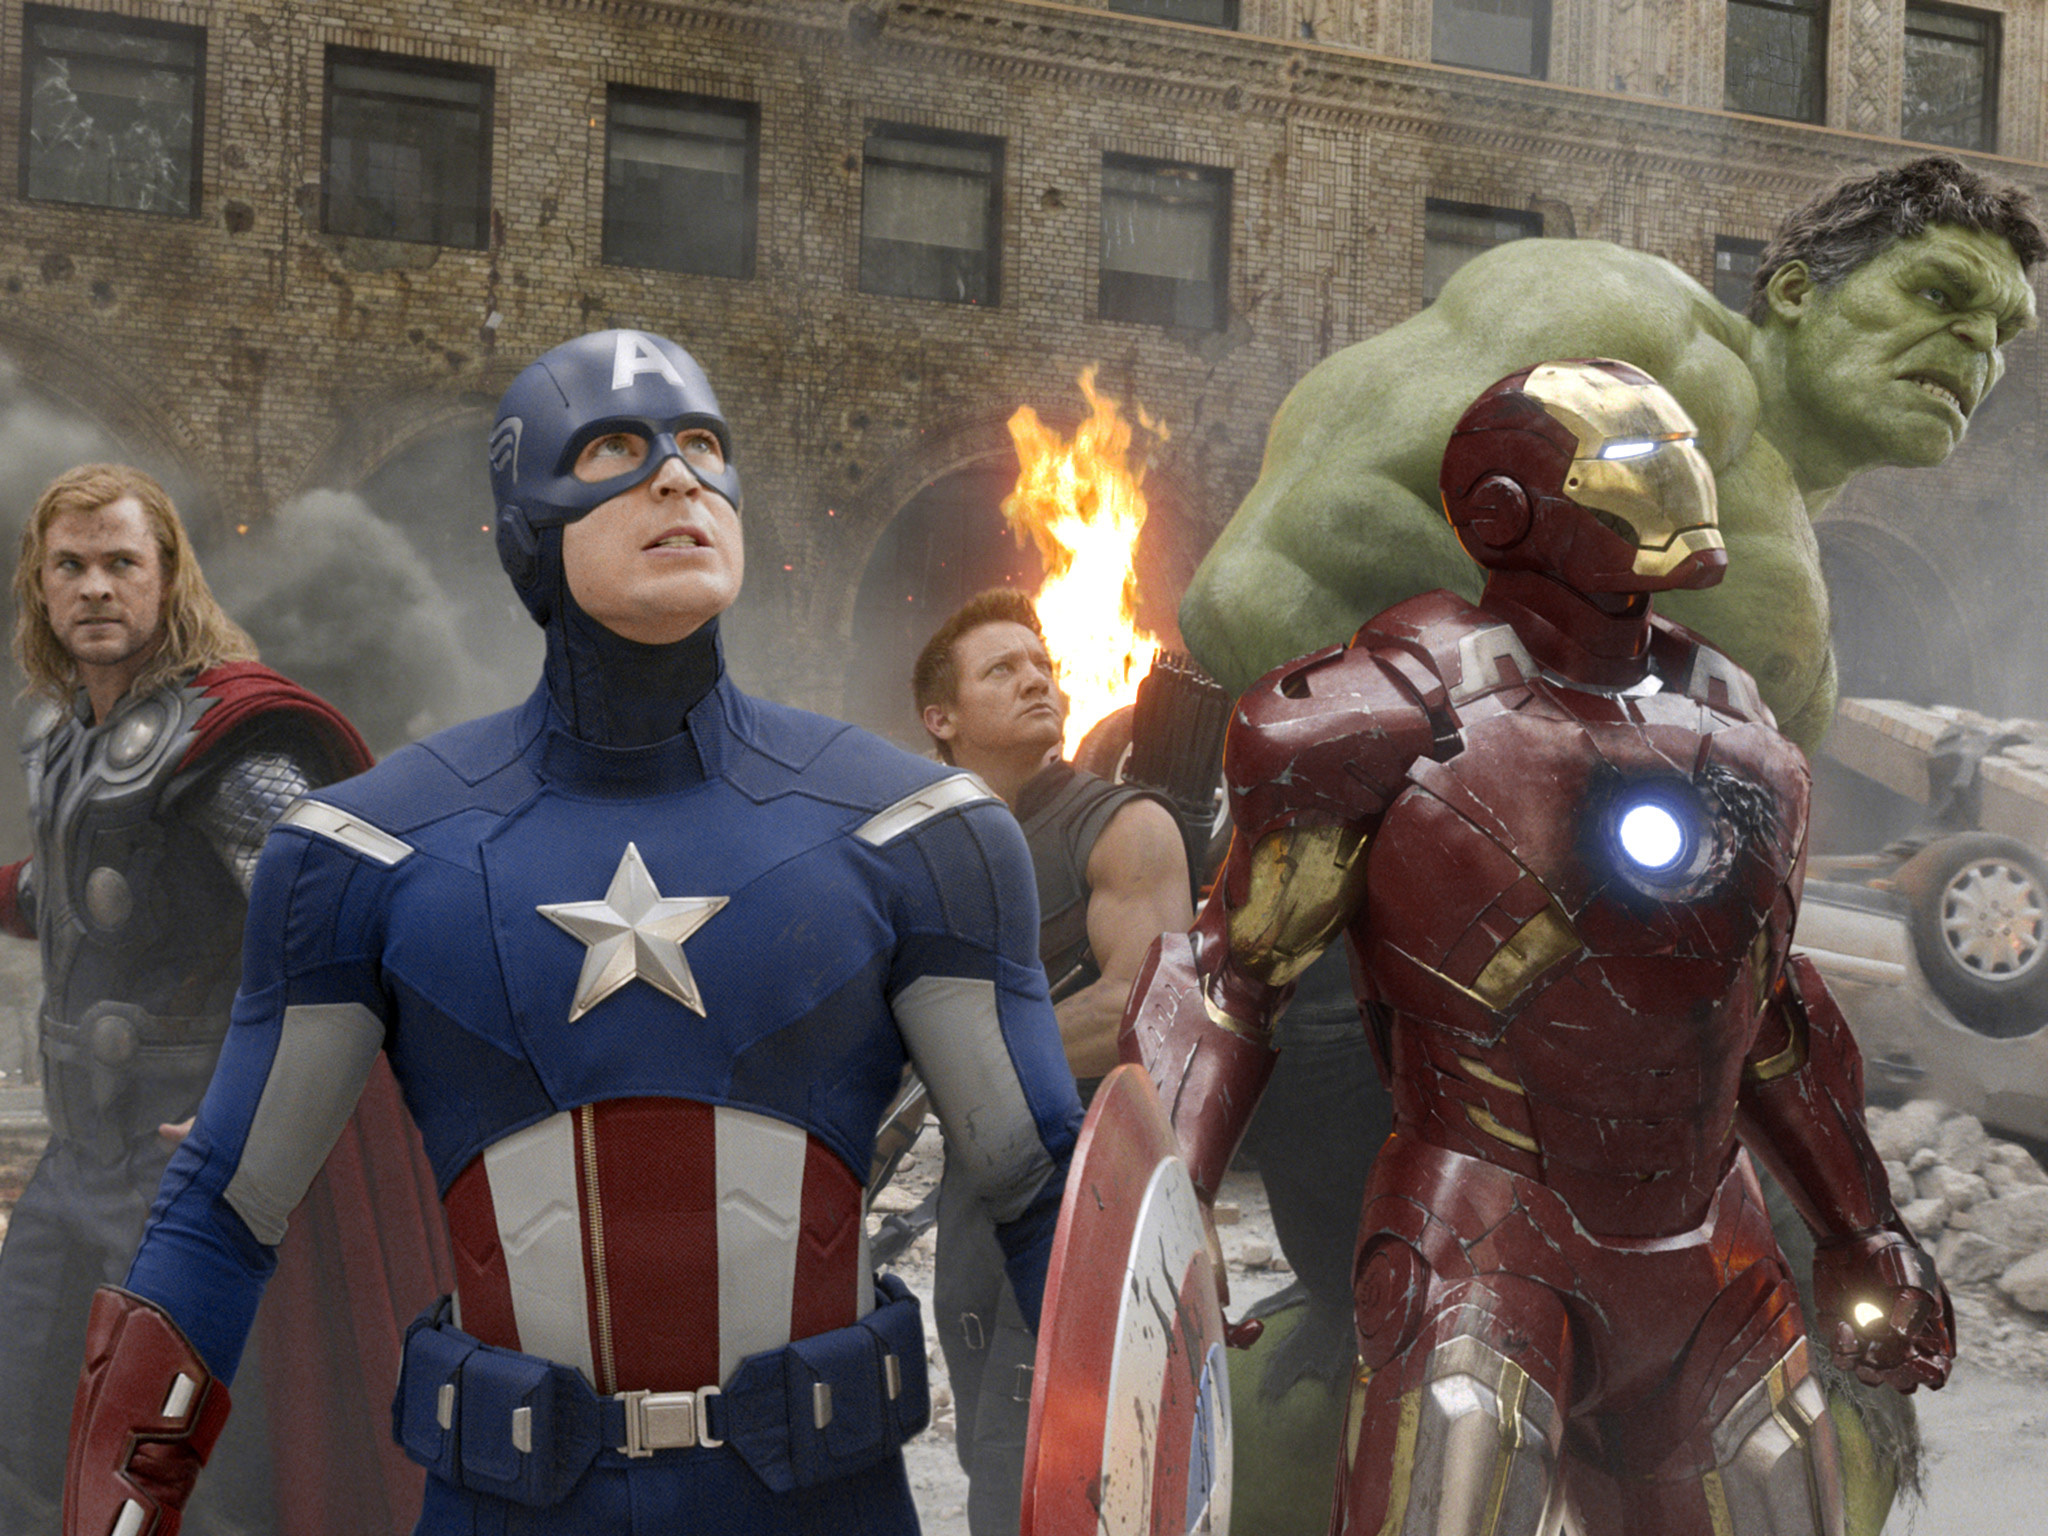 Avengers Assemble, superhero movies